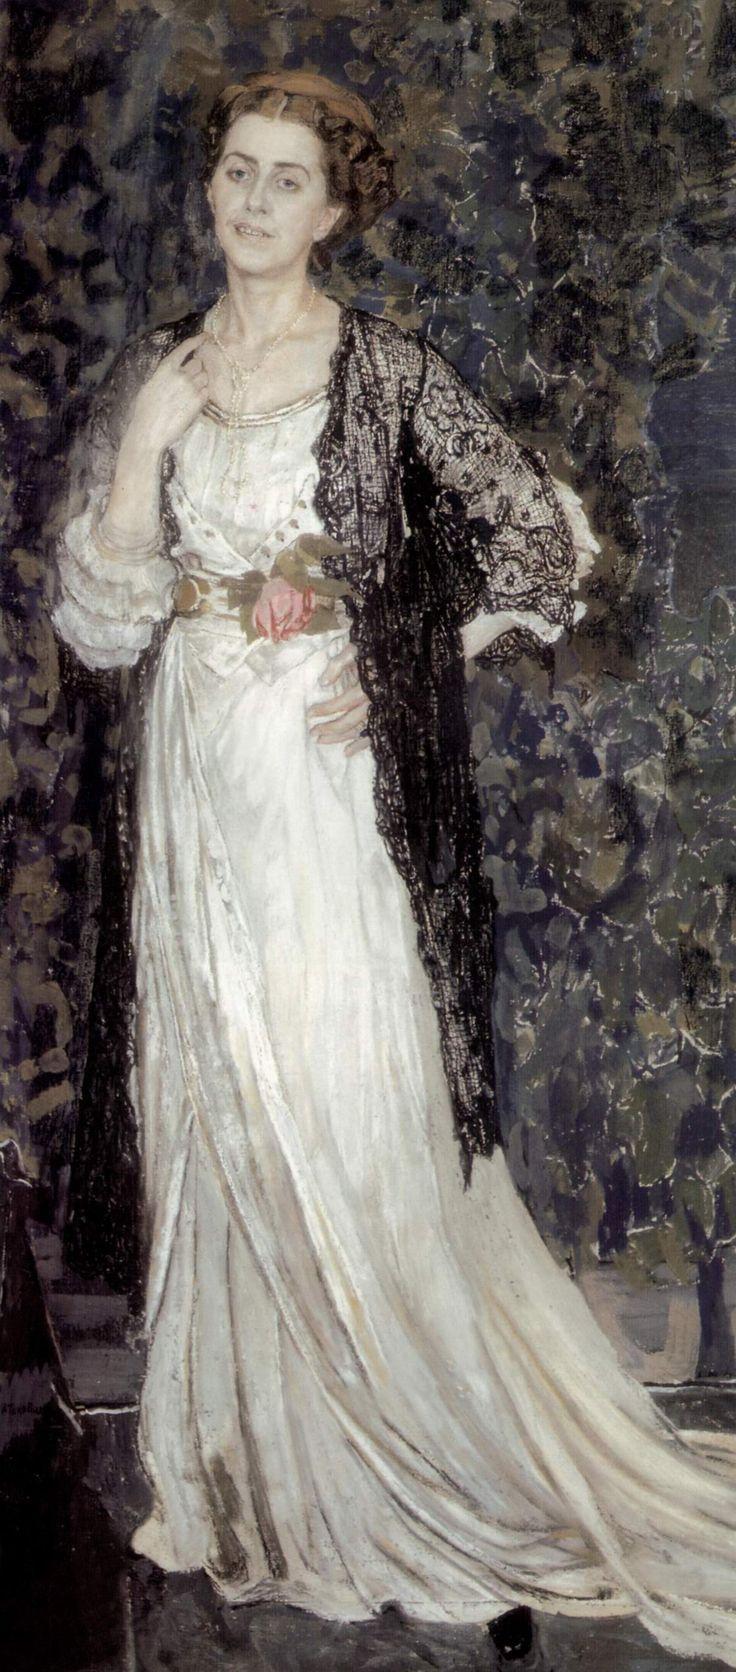 Aleksandr Golovin (Russian, 1863-1930) - Portrait of Marina Erastovna Makovskaya